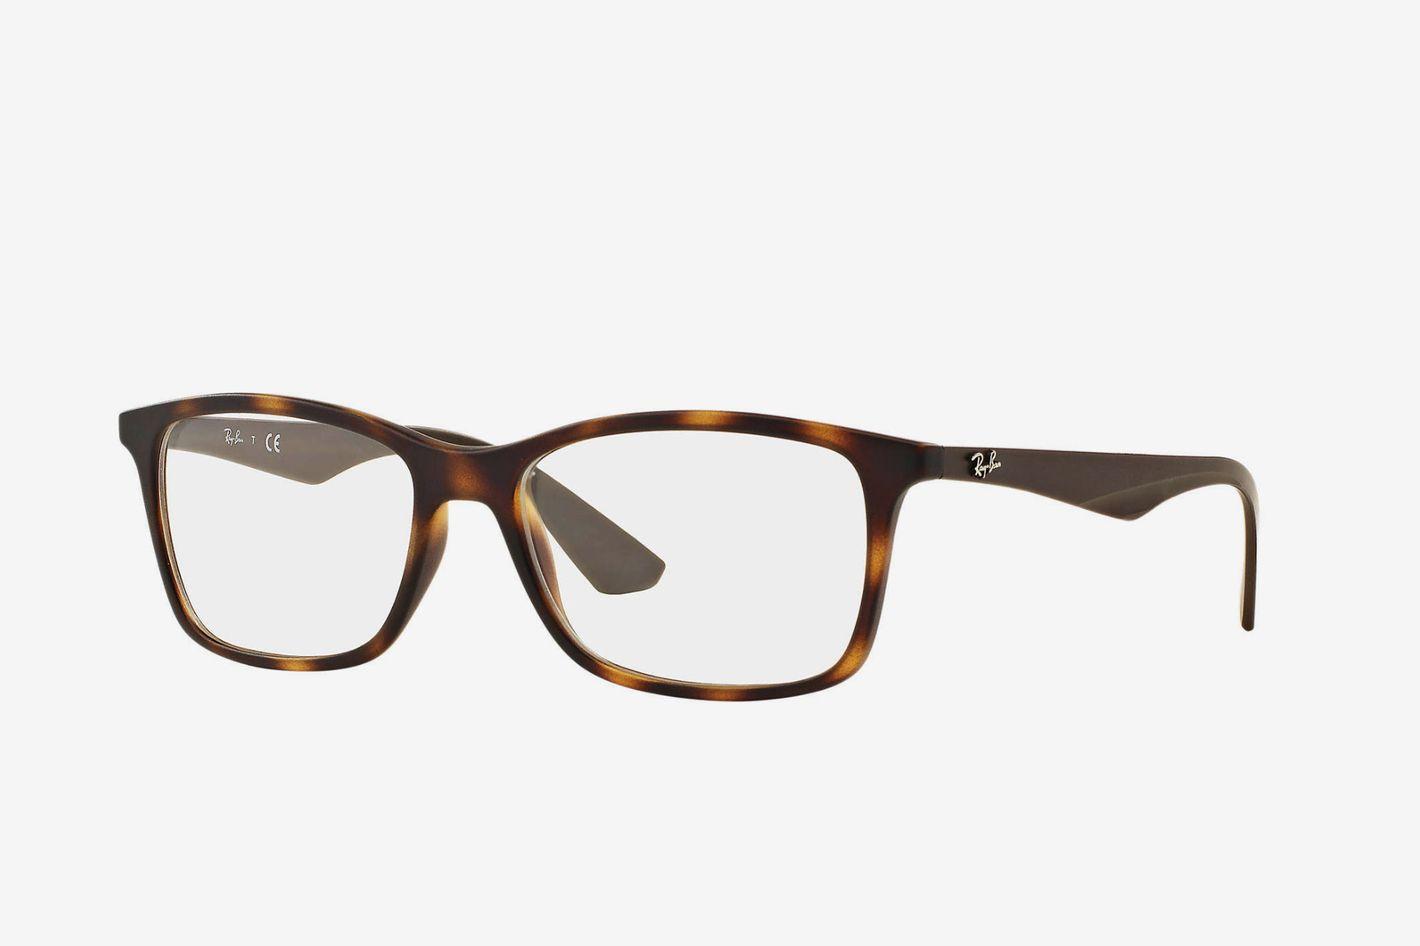 Ray-Ban RB7047 Tortoise Eyeglasses